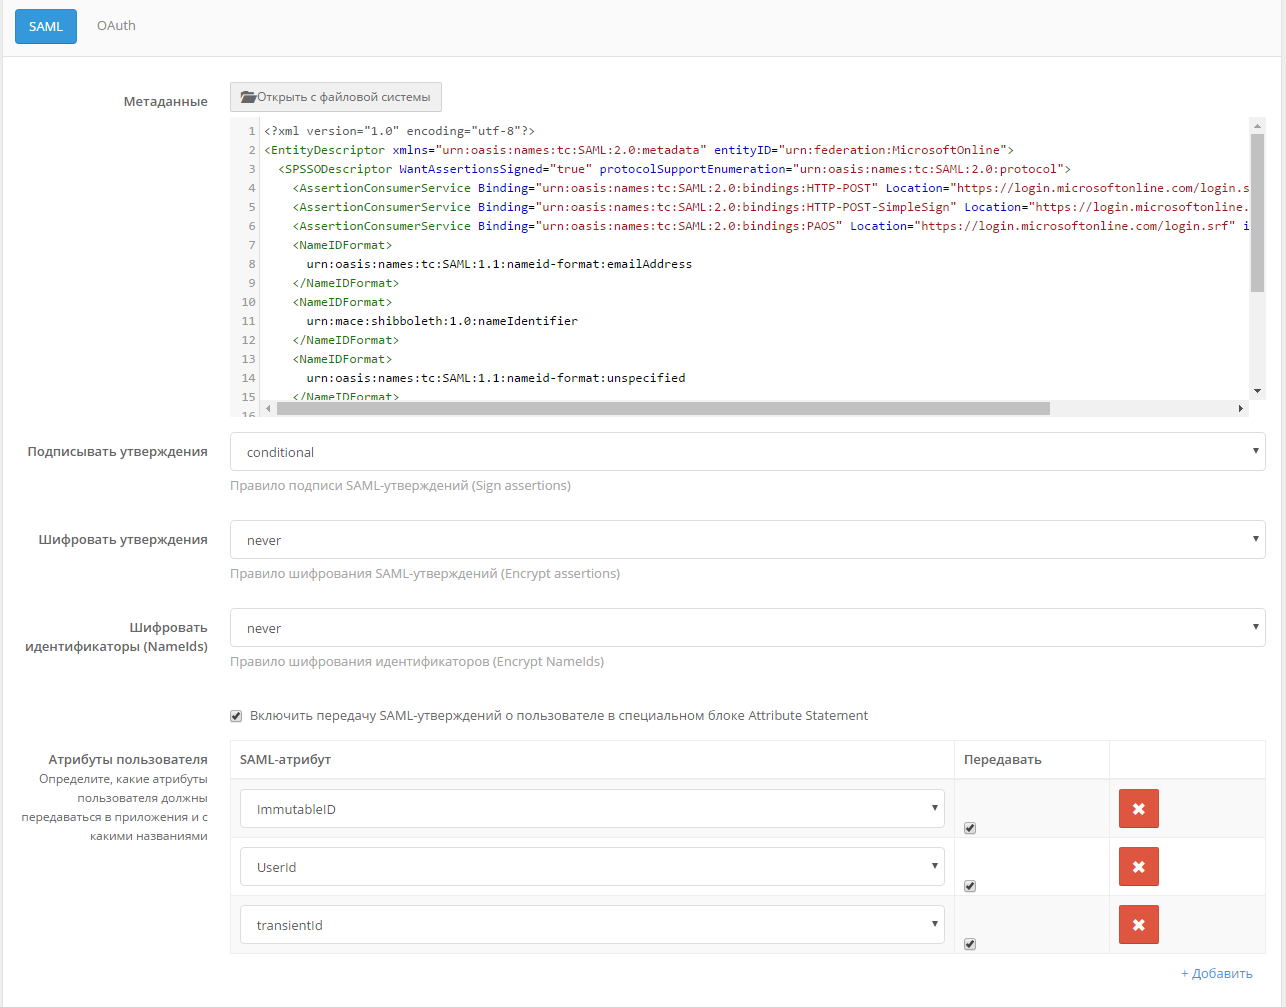 Настройка SAML-подключения для Microsoft Office 365